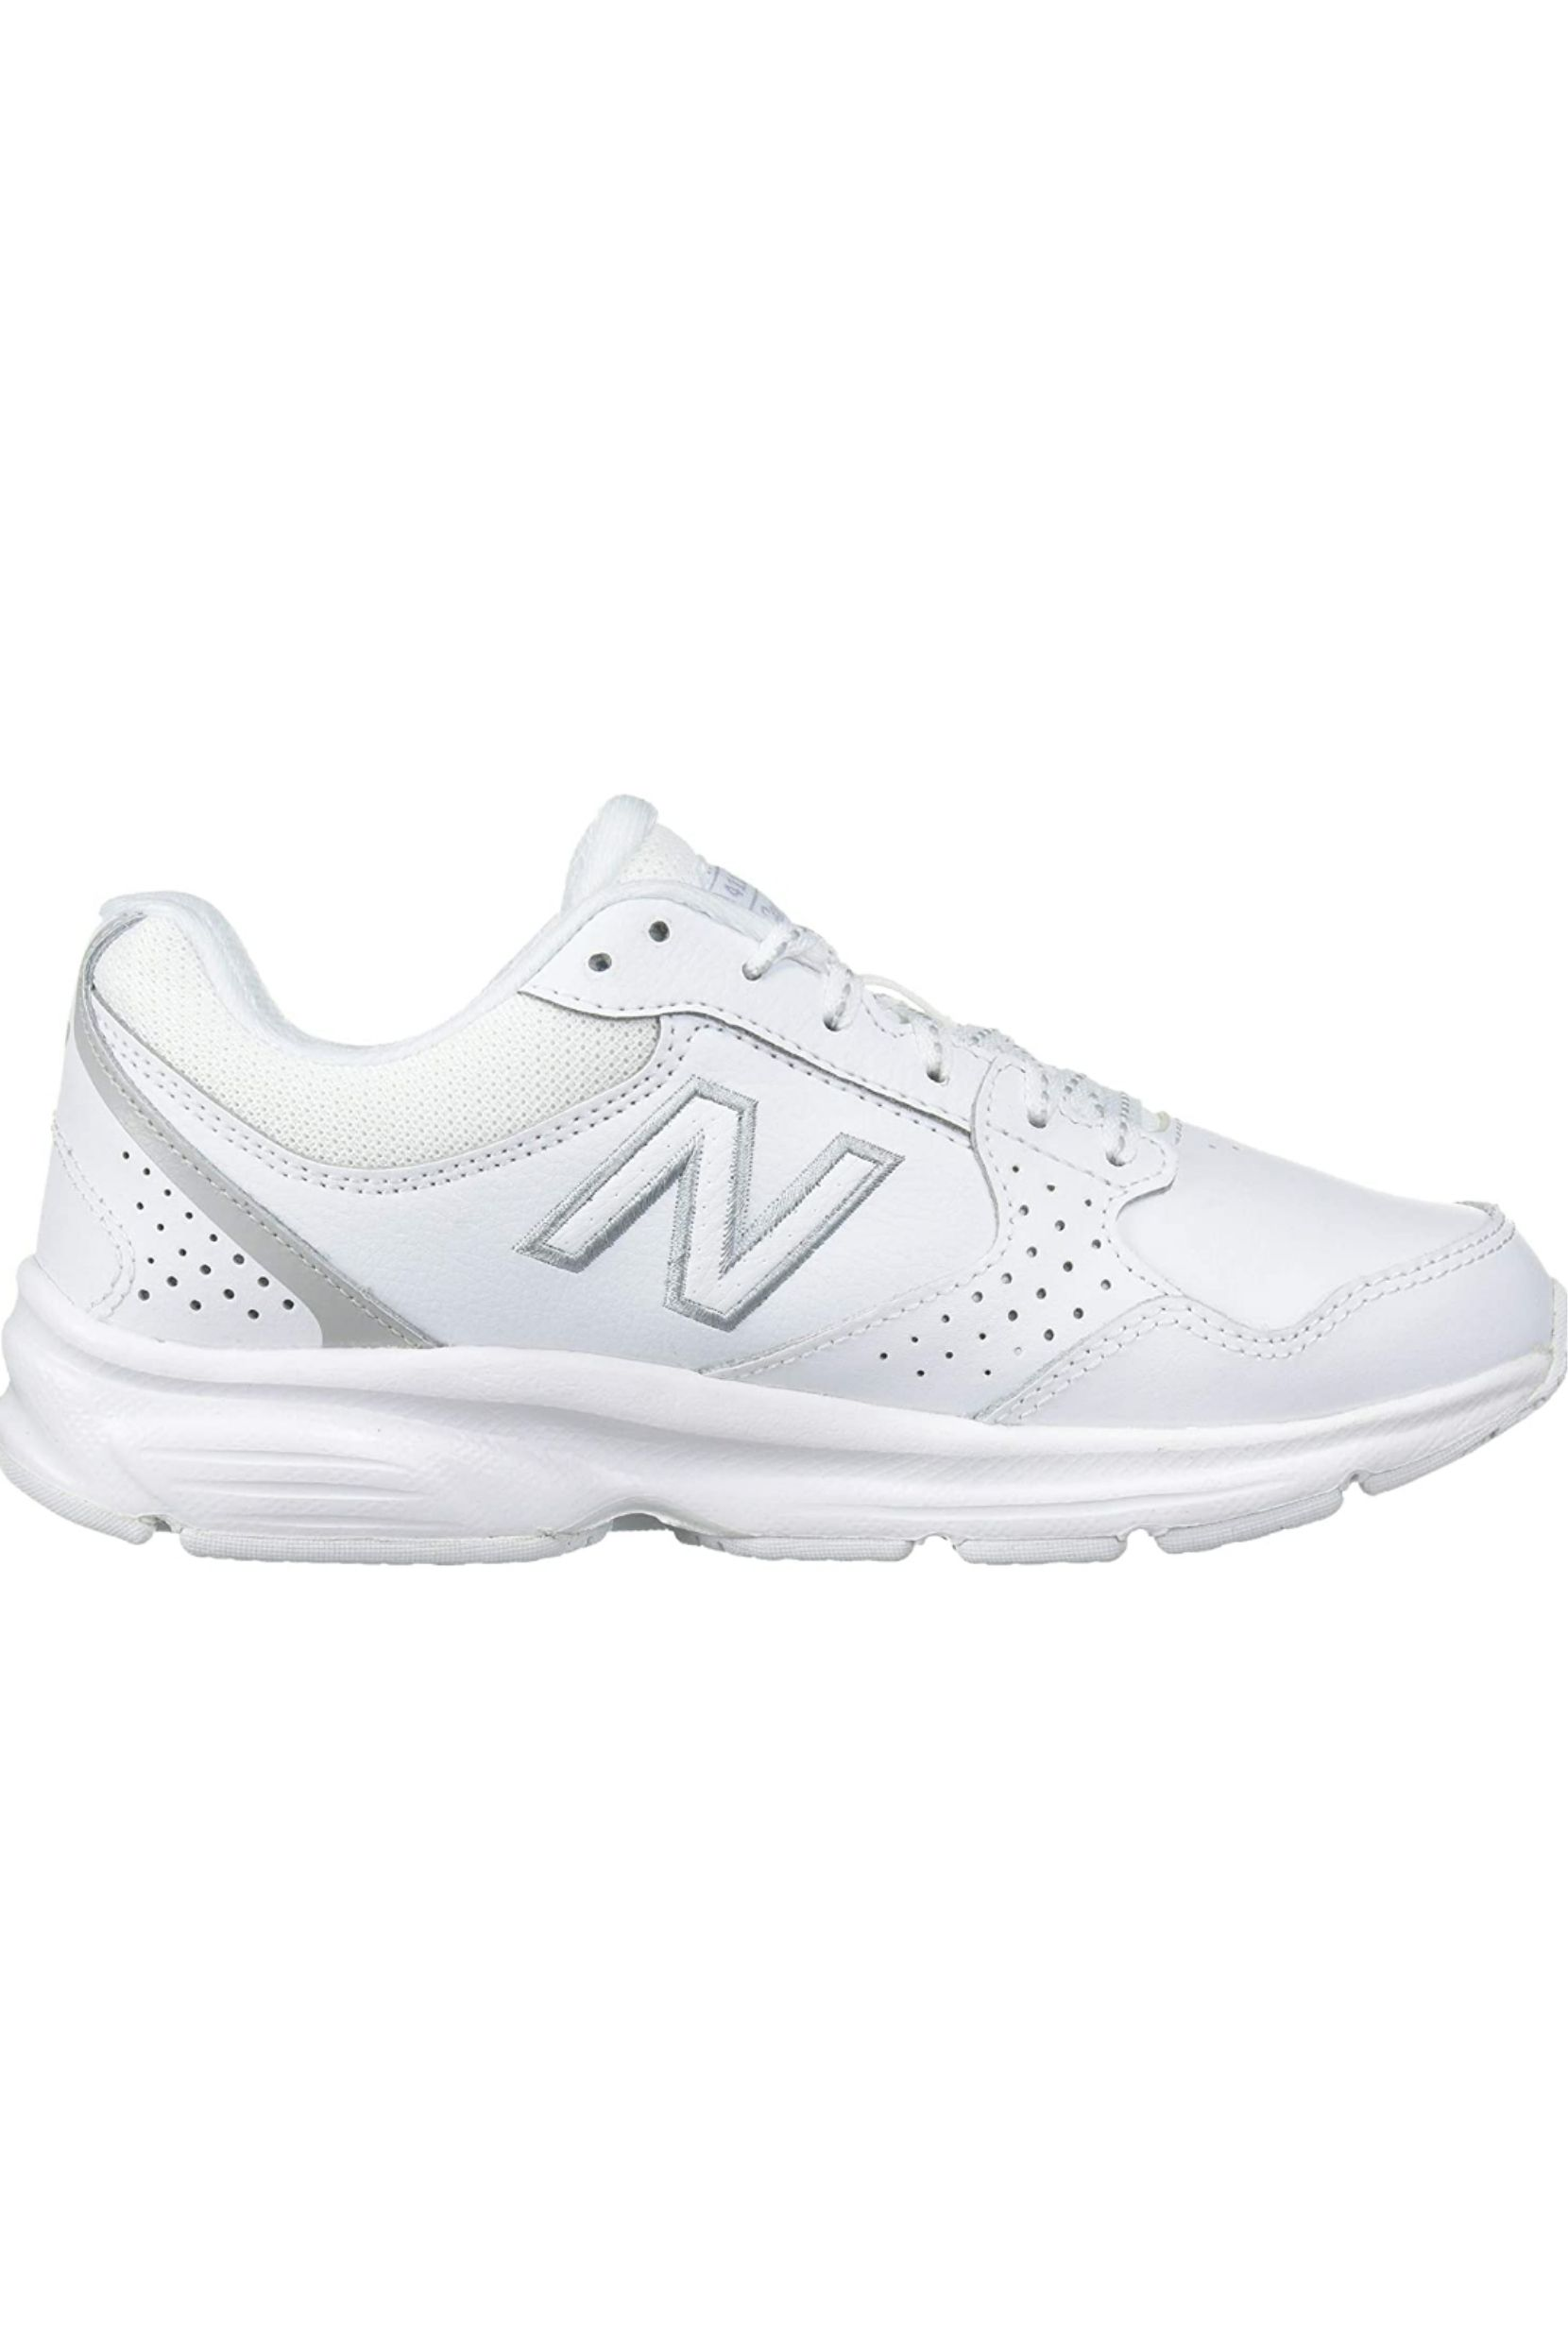 Sangriento Aceptado Tahití  New Balance Women's 411 V1 Walking Shoe. in 2020 | Cute addidas shoes,  Winter fashion shoes, New balance women